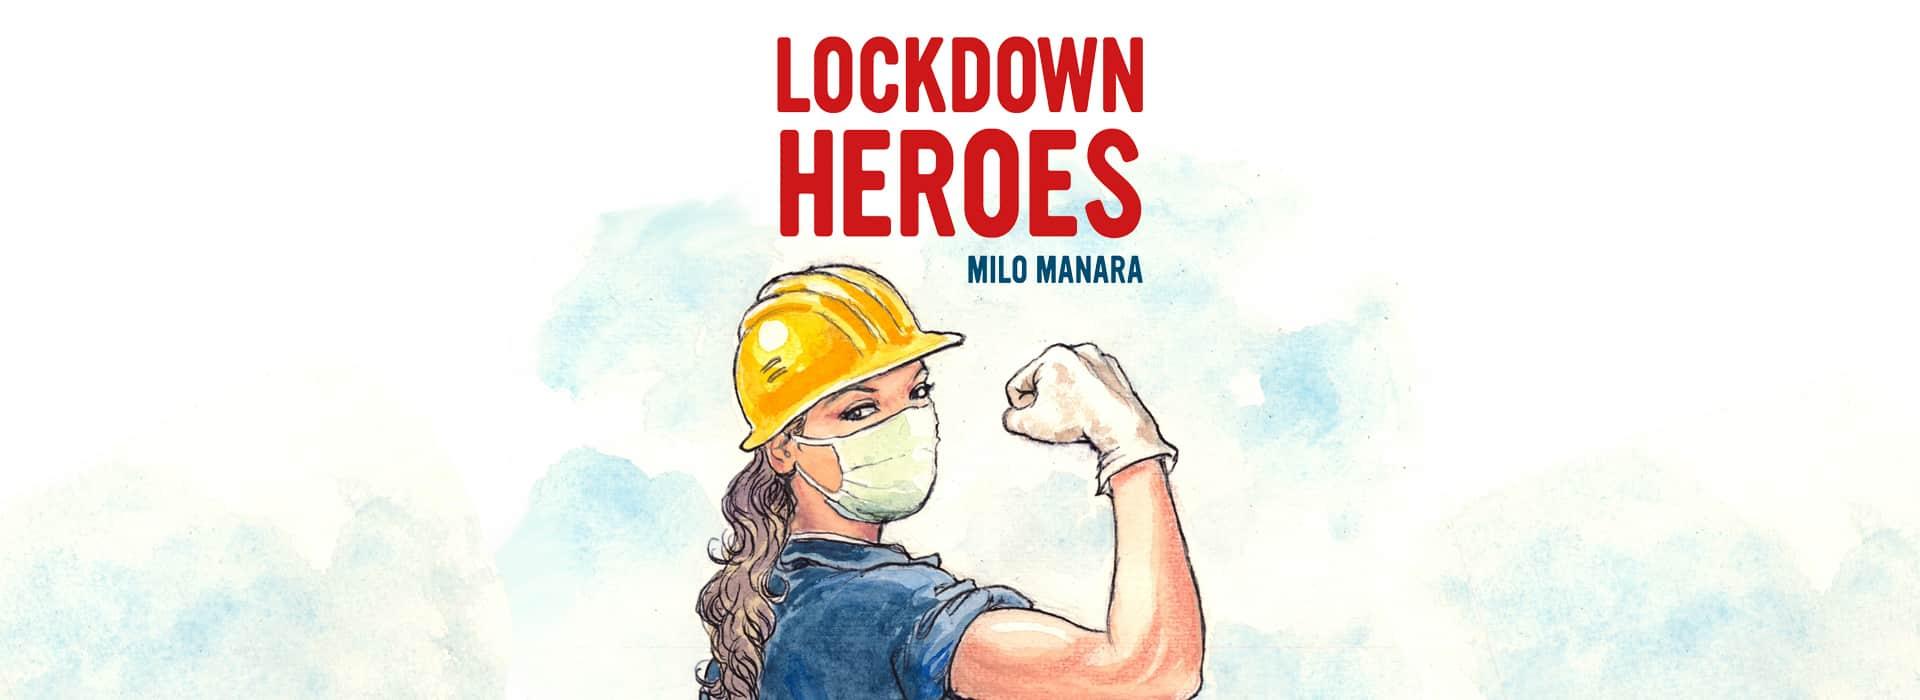 Lockdown Heroes, il portfolio di Milo Manara thumbnail